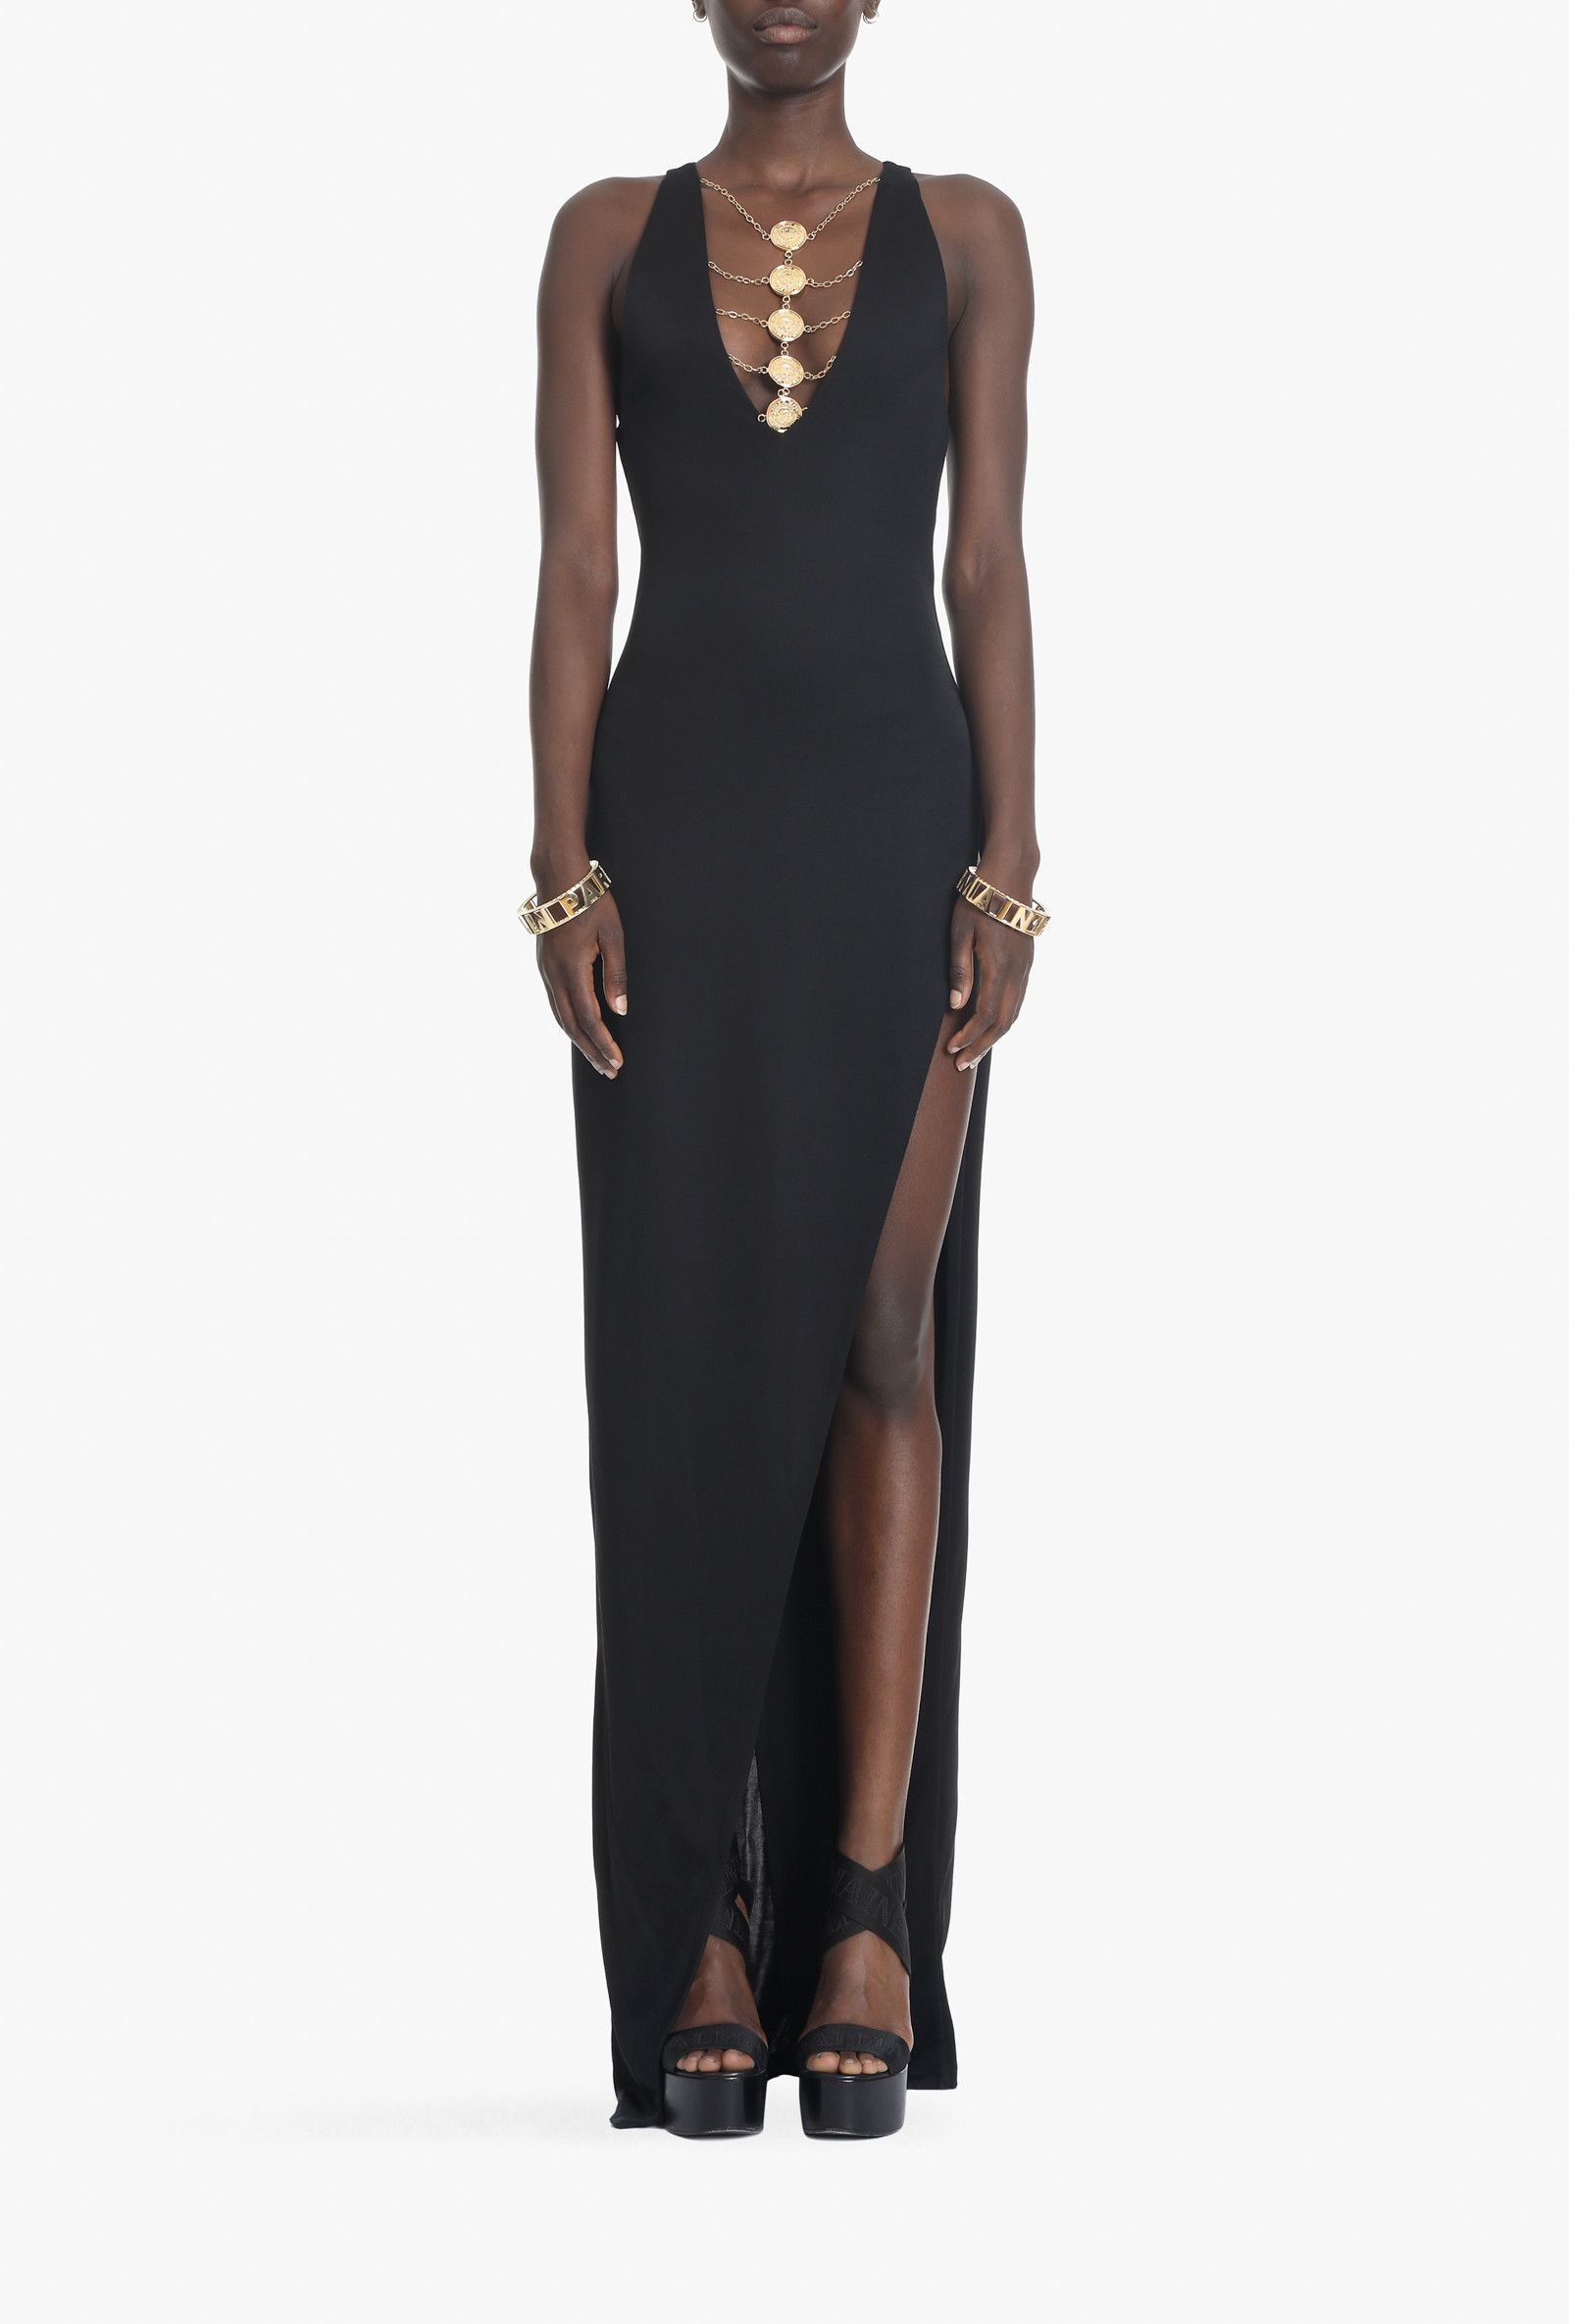 Dress for Women, Evening Cocktail Party On Sale, Black, Viscose, 2017, 8 Balmain